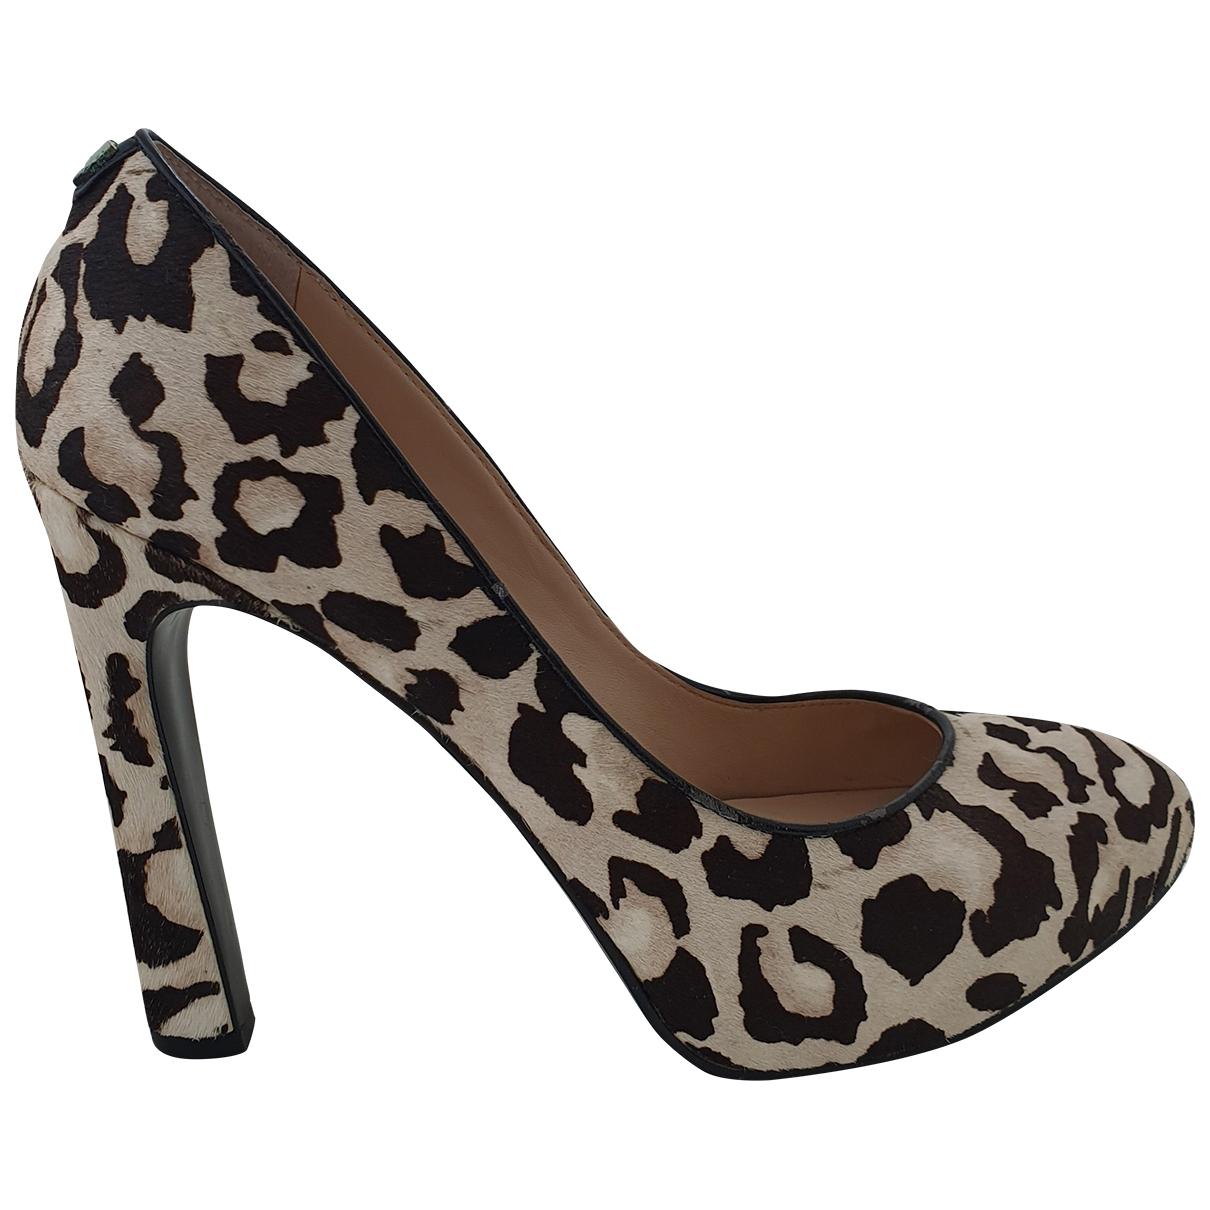 Guess \N Pony-style calfskin Heels for Women 39 EU